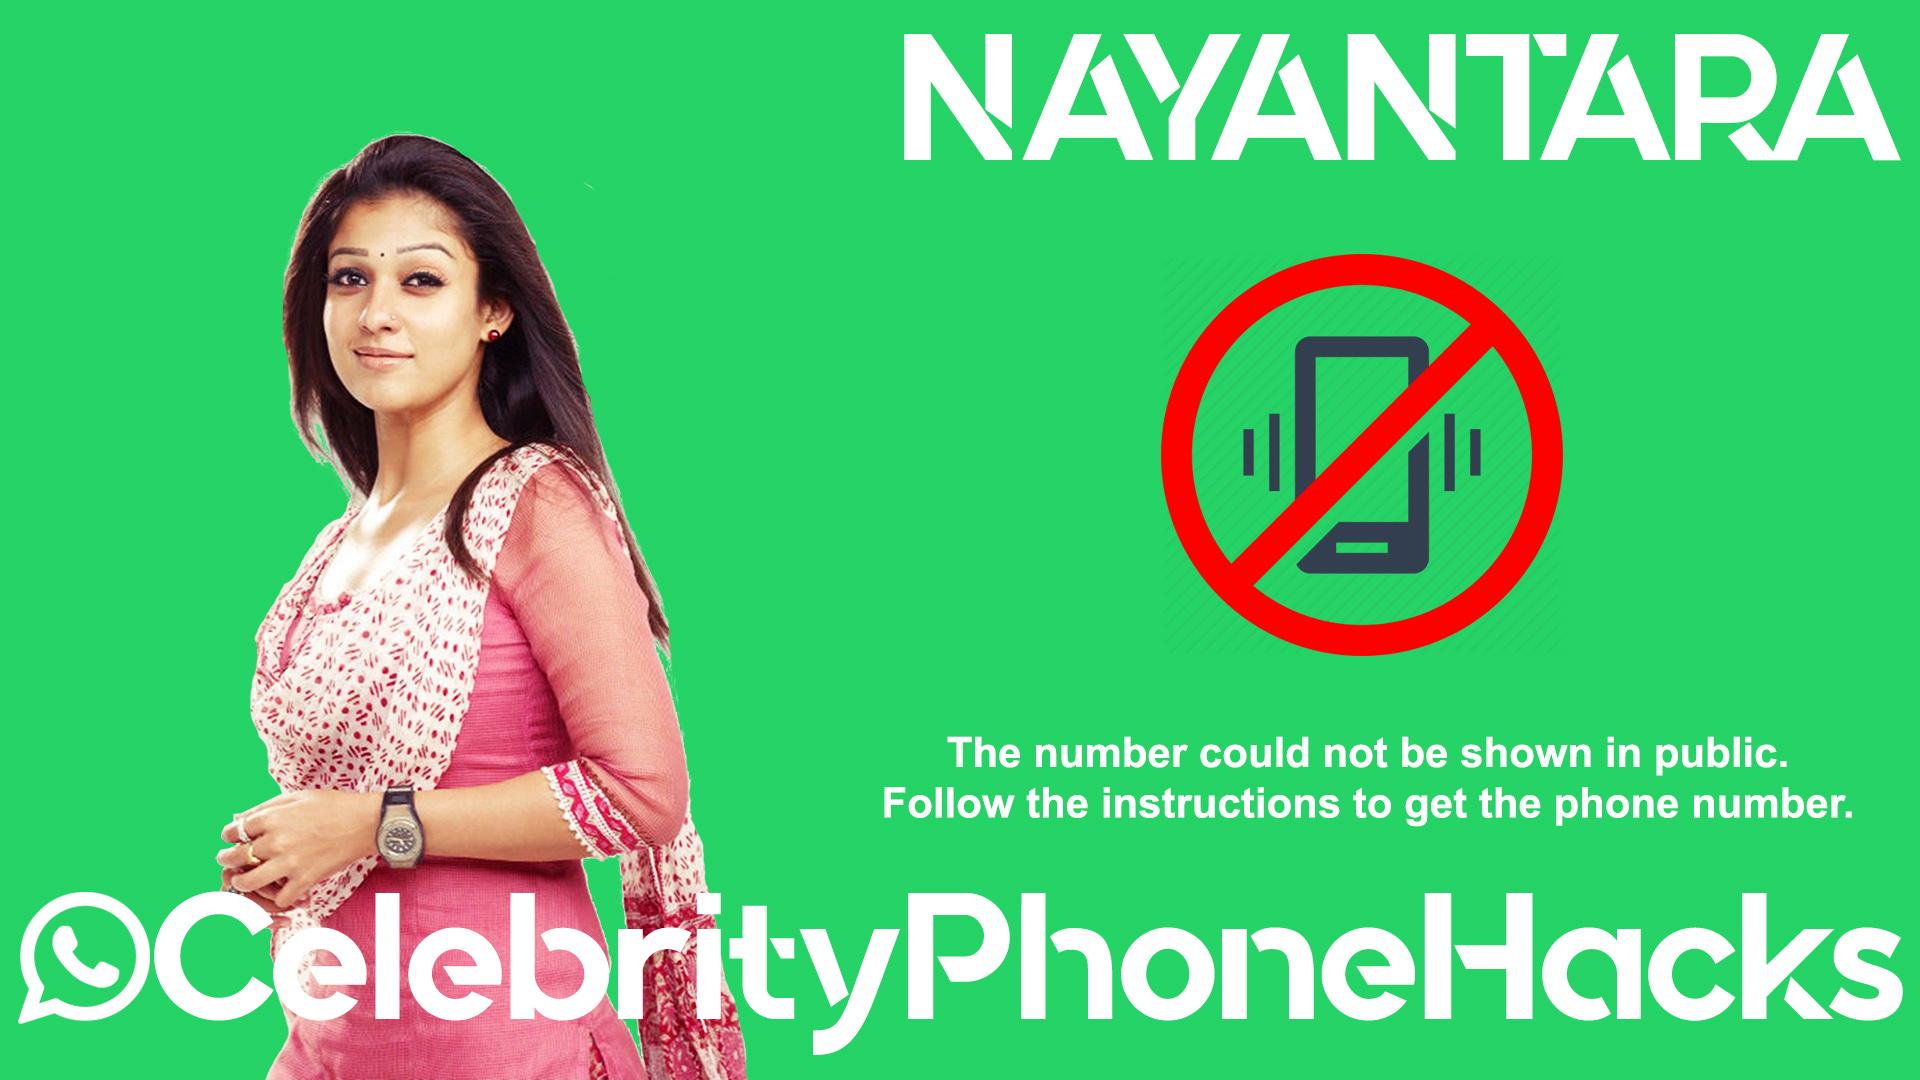 Nayantara real phone number 2019 whatsapp hacked leaked